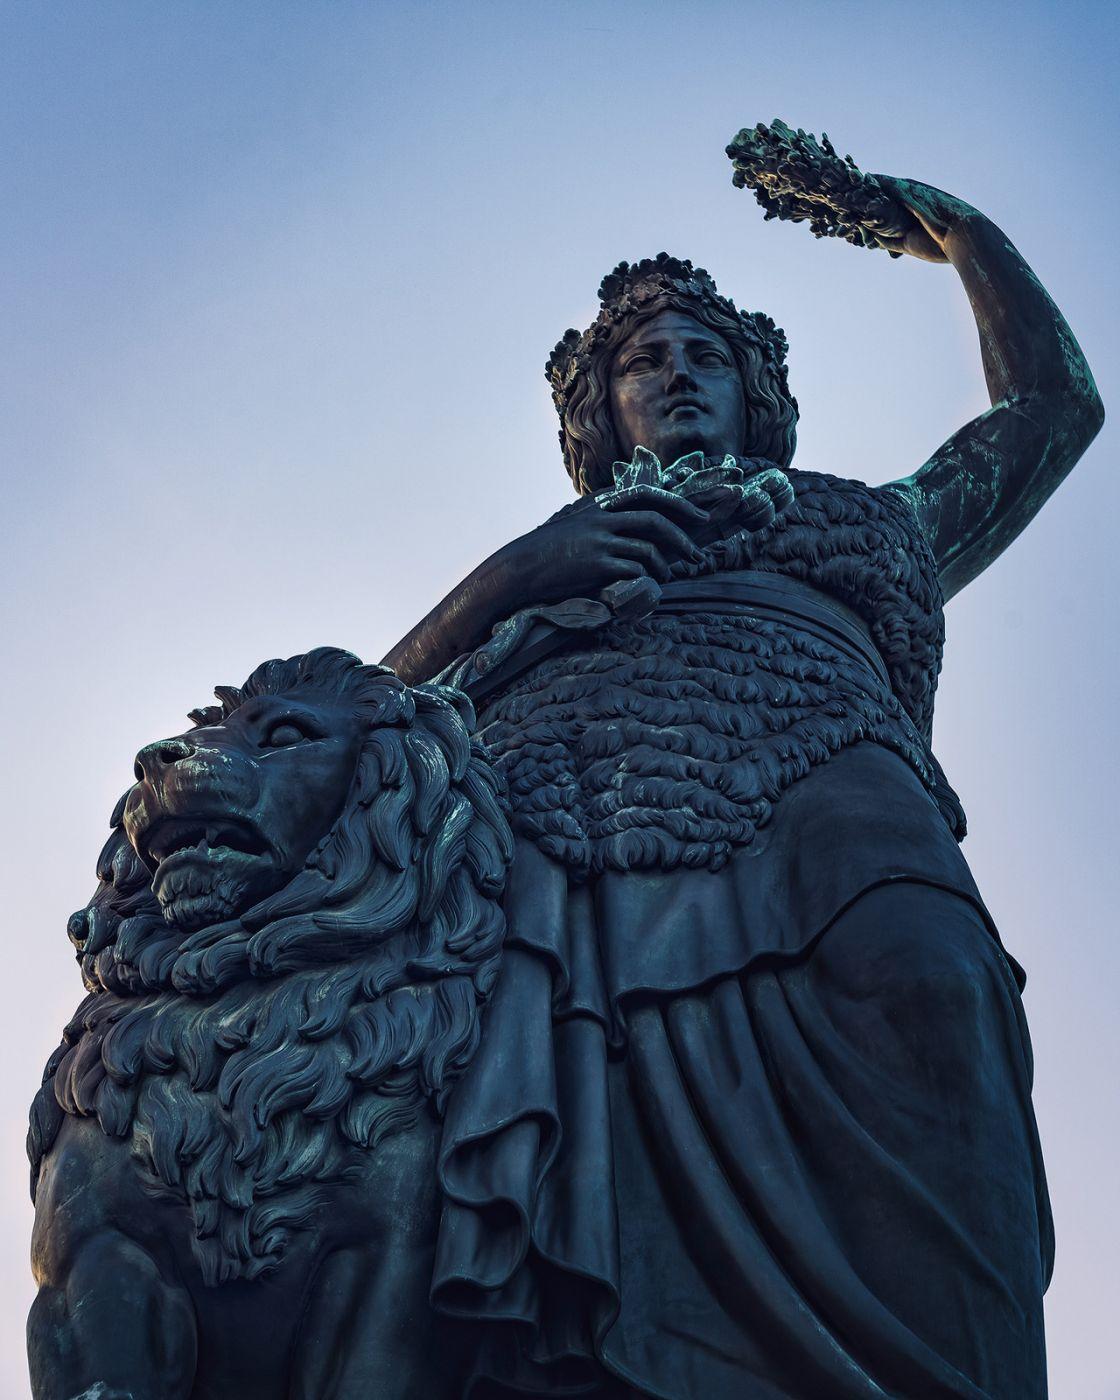 Bavaria (statue), Theresienwiese, Munich, Germany